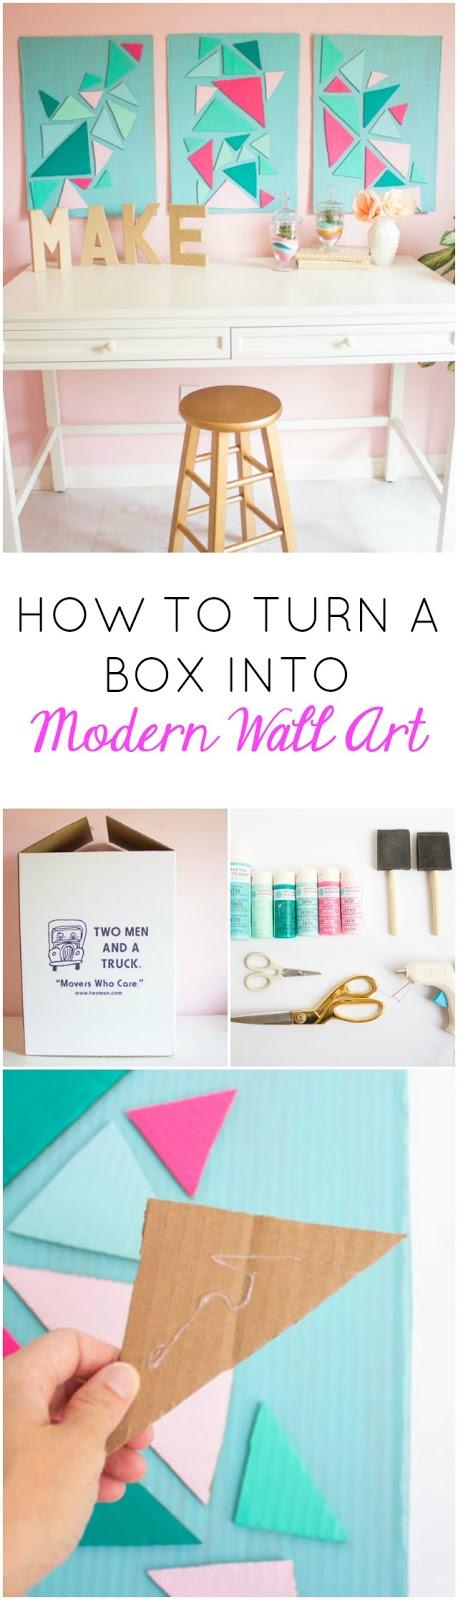 How to turn a cardboard box into modern wall art - so cool!